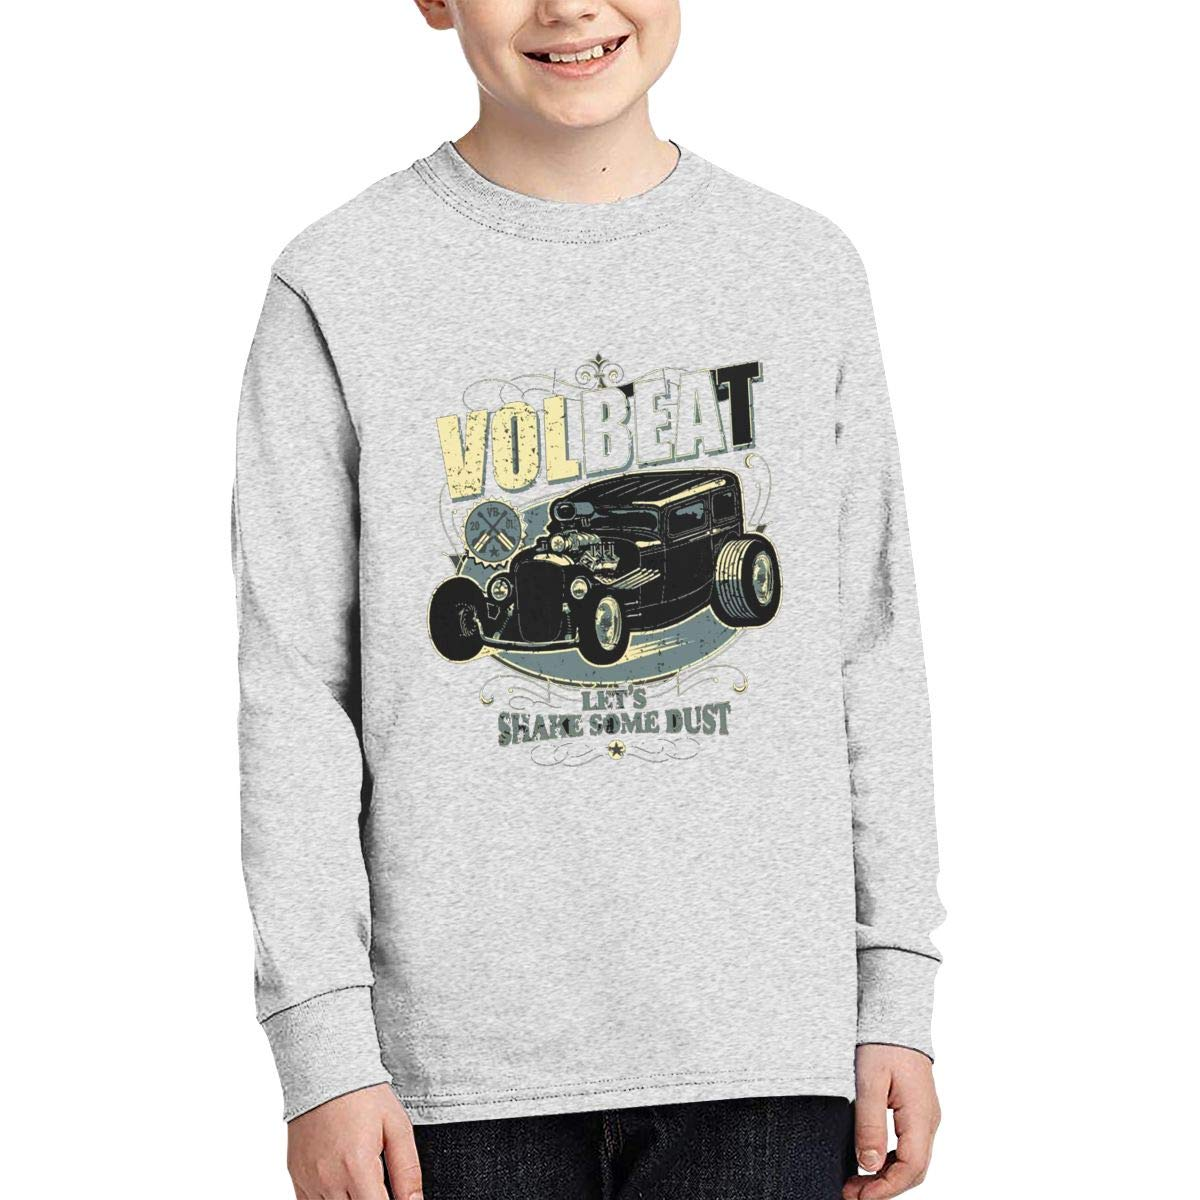 Volbeat Boys Fashion Classic Long Sleeve T-Shirt Boy Long Sleeve Cotton Round Neck T-Shirt